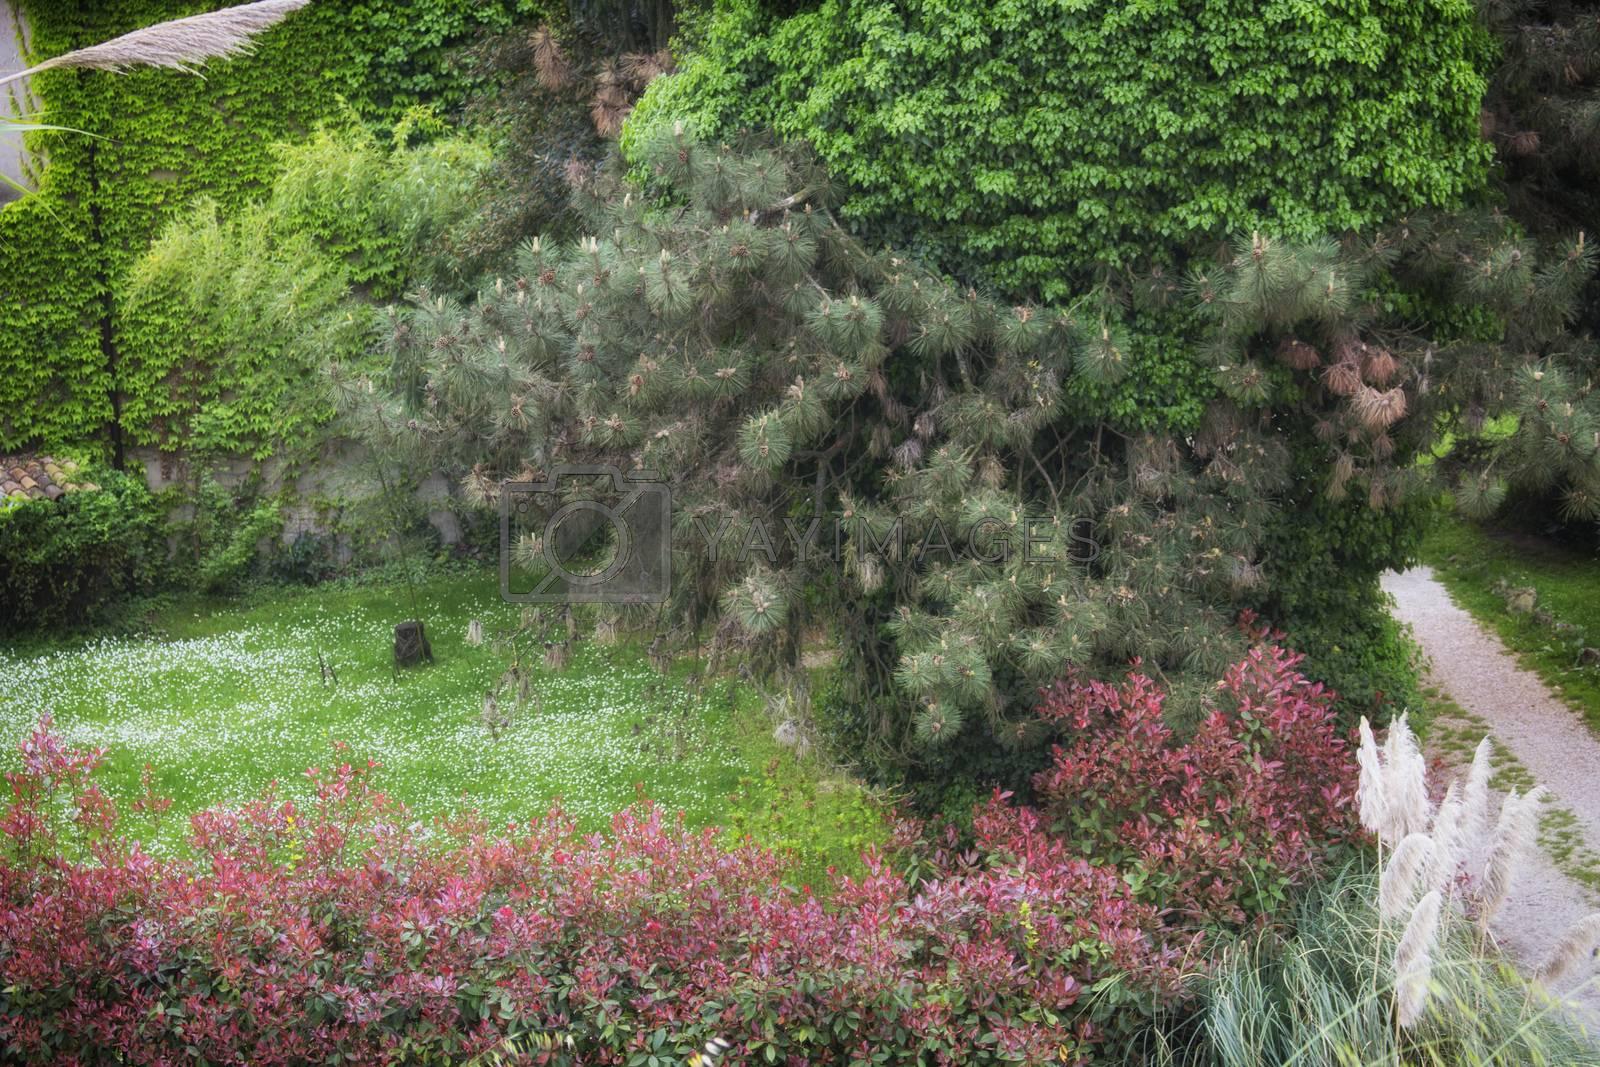 White daisy and green trees in Italian garden